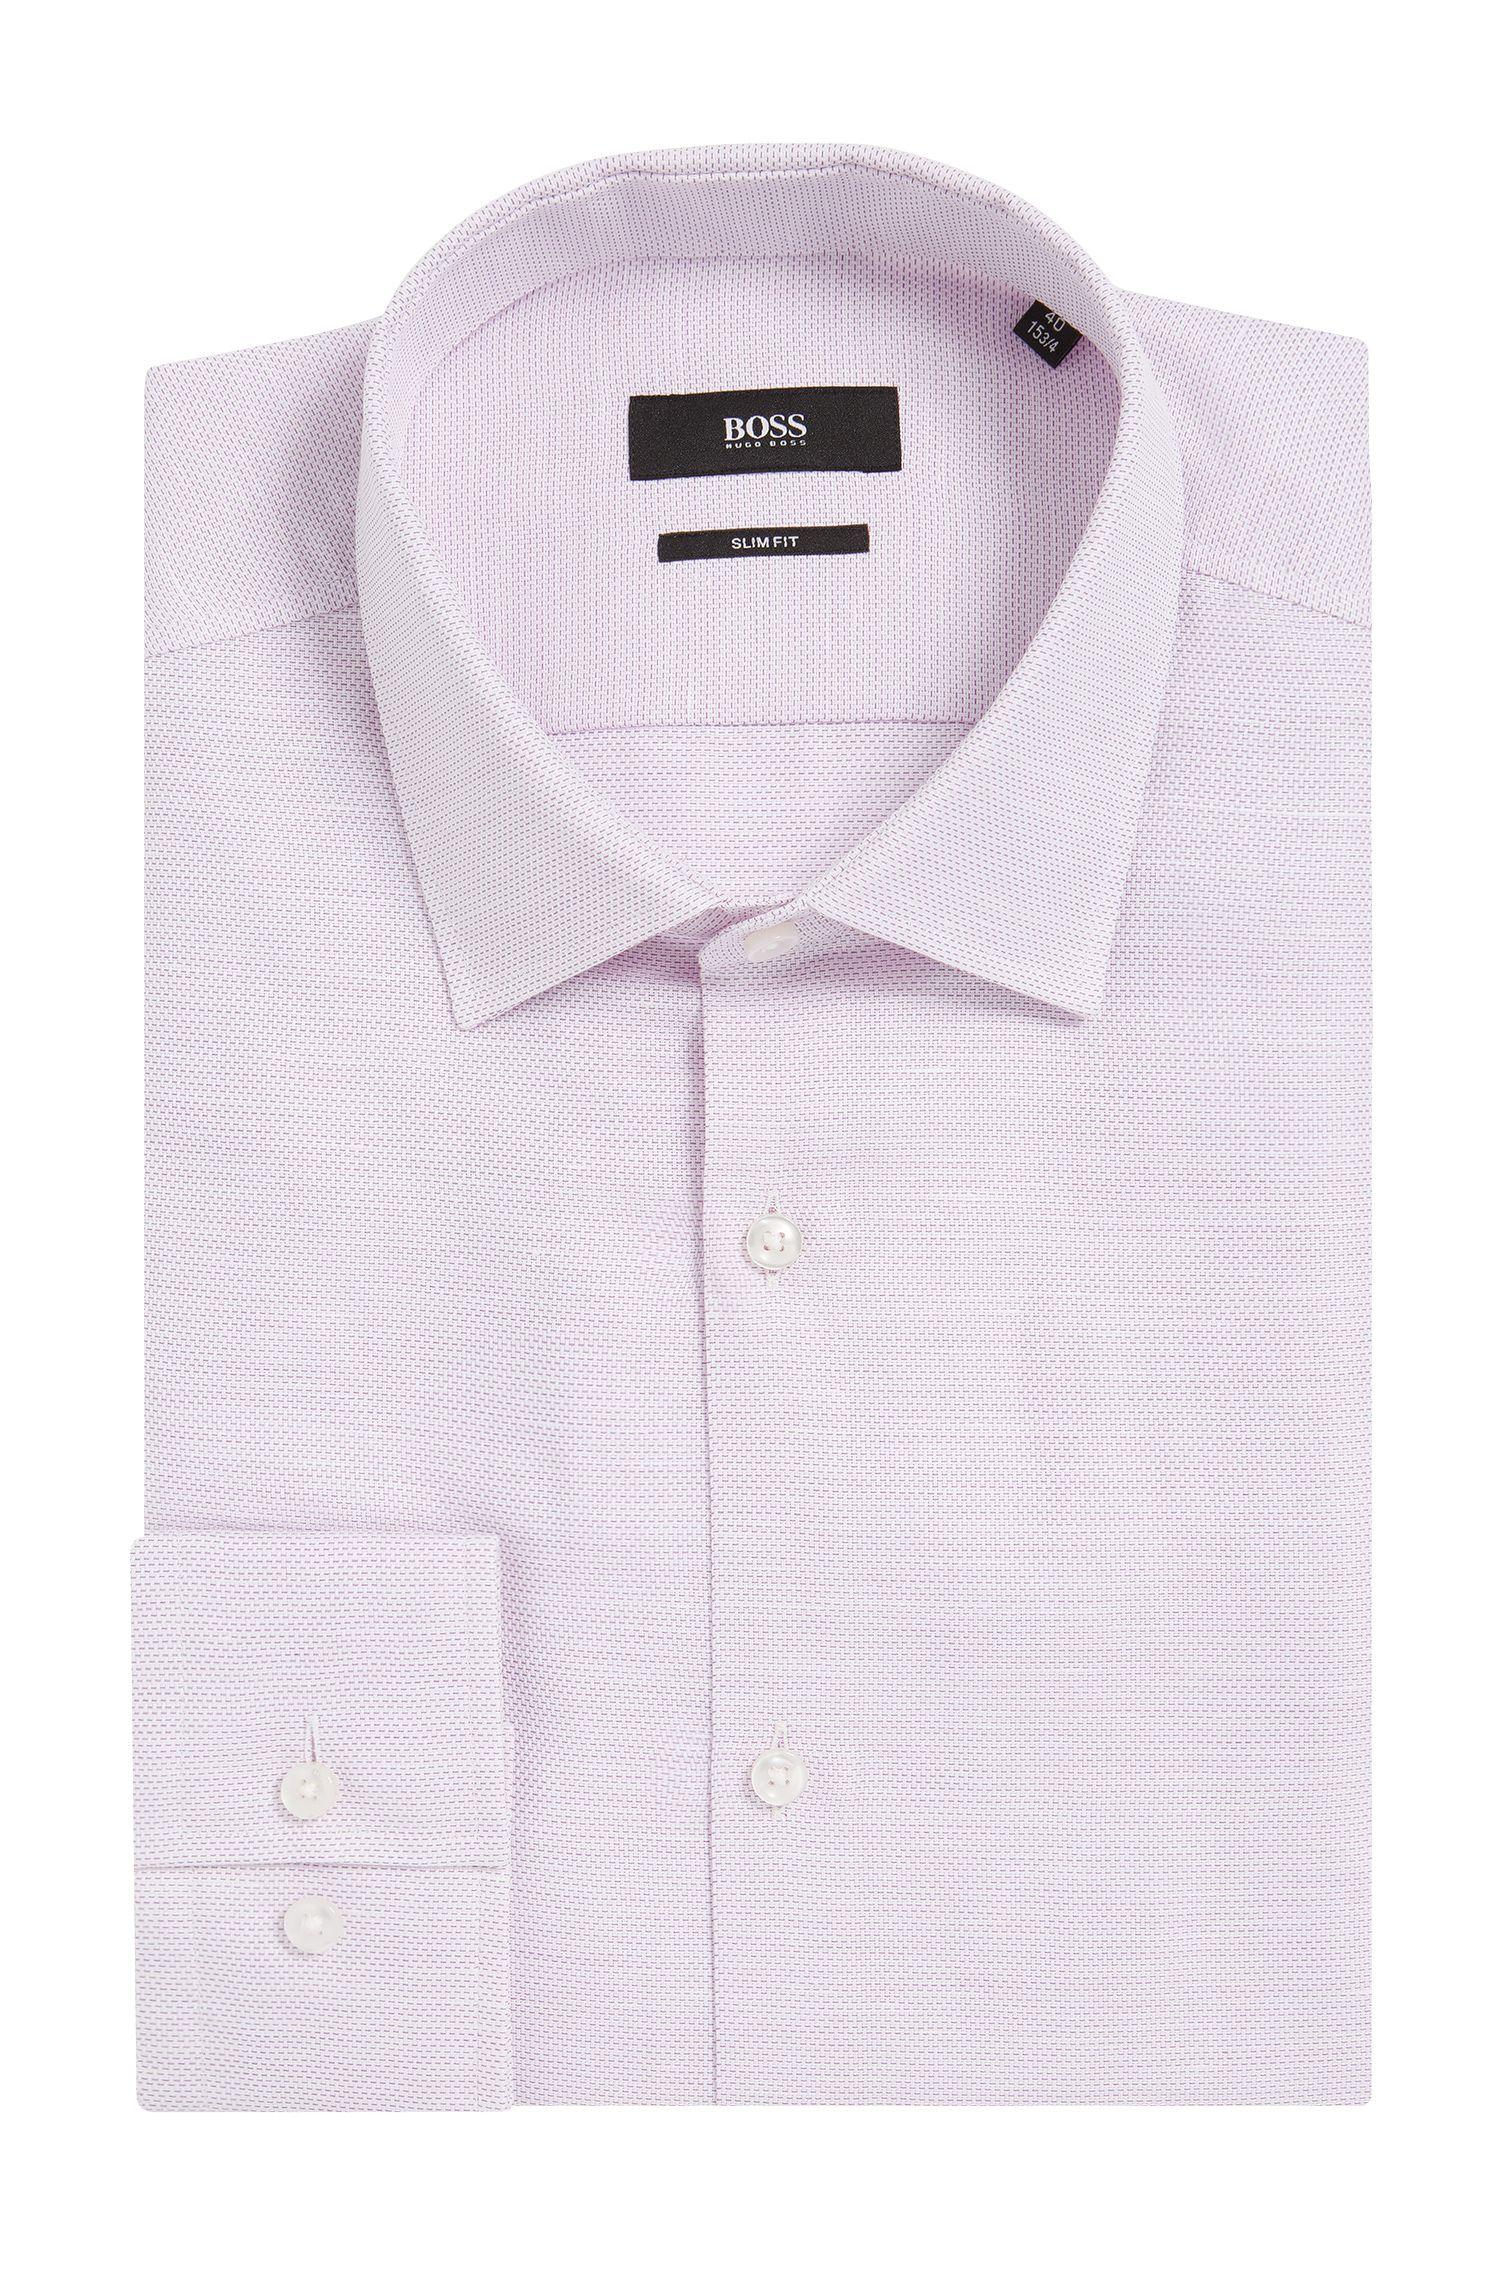 Basketweave Cotton Linen Dress Shirt, Slim Fit | Jenno